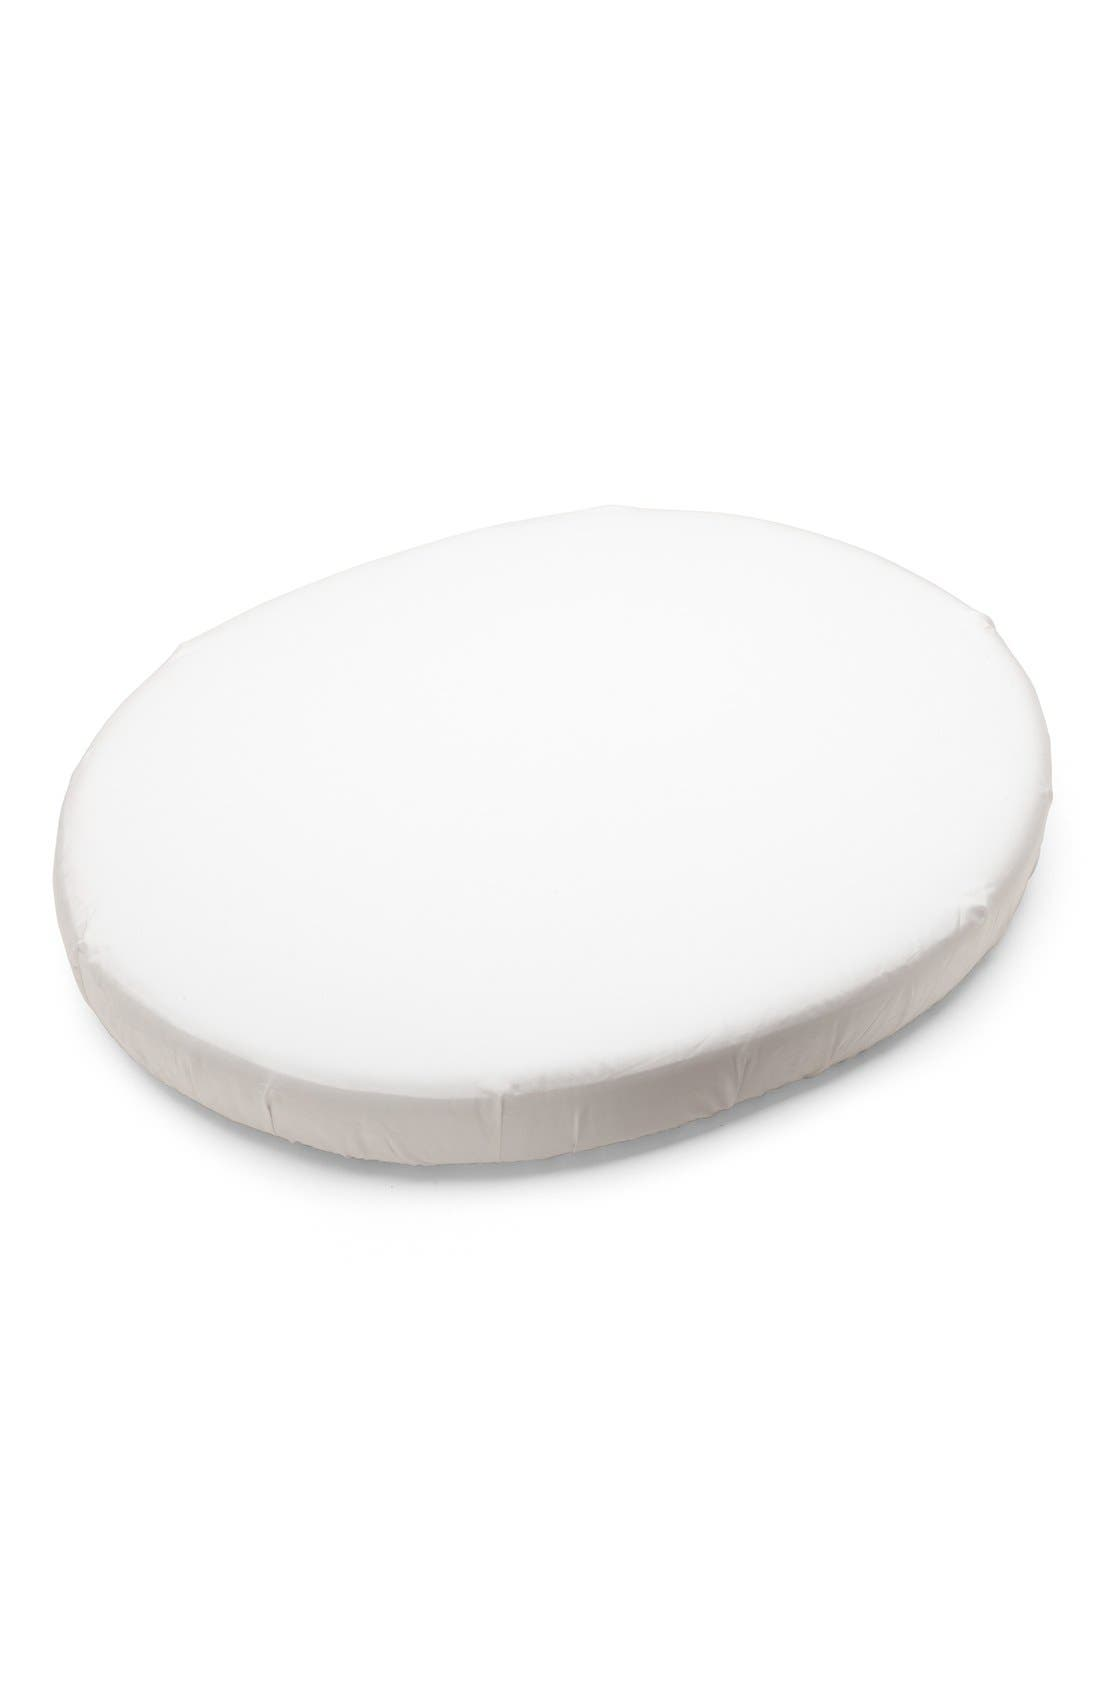 Sleepi Mini Fitted Cotton Sheet,                             Main thumbnail 1, color,                             WHITE